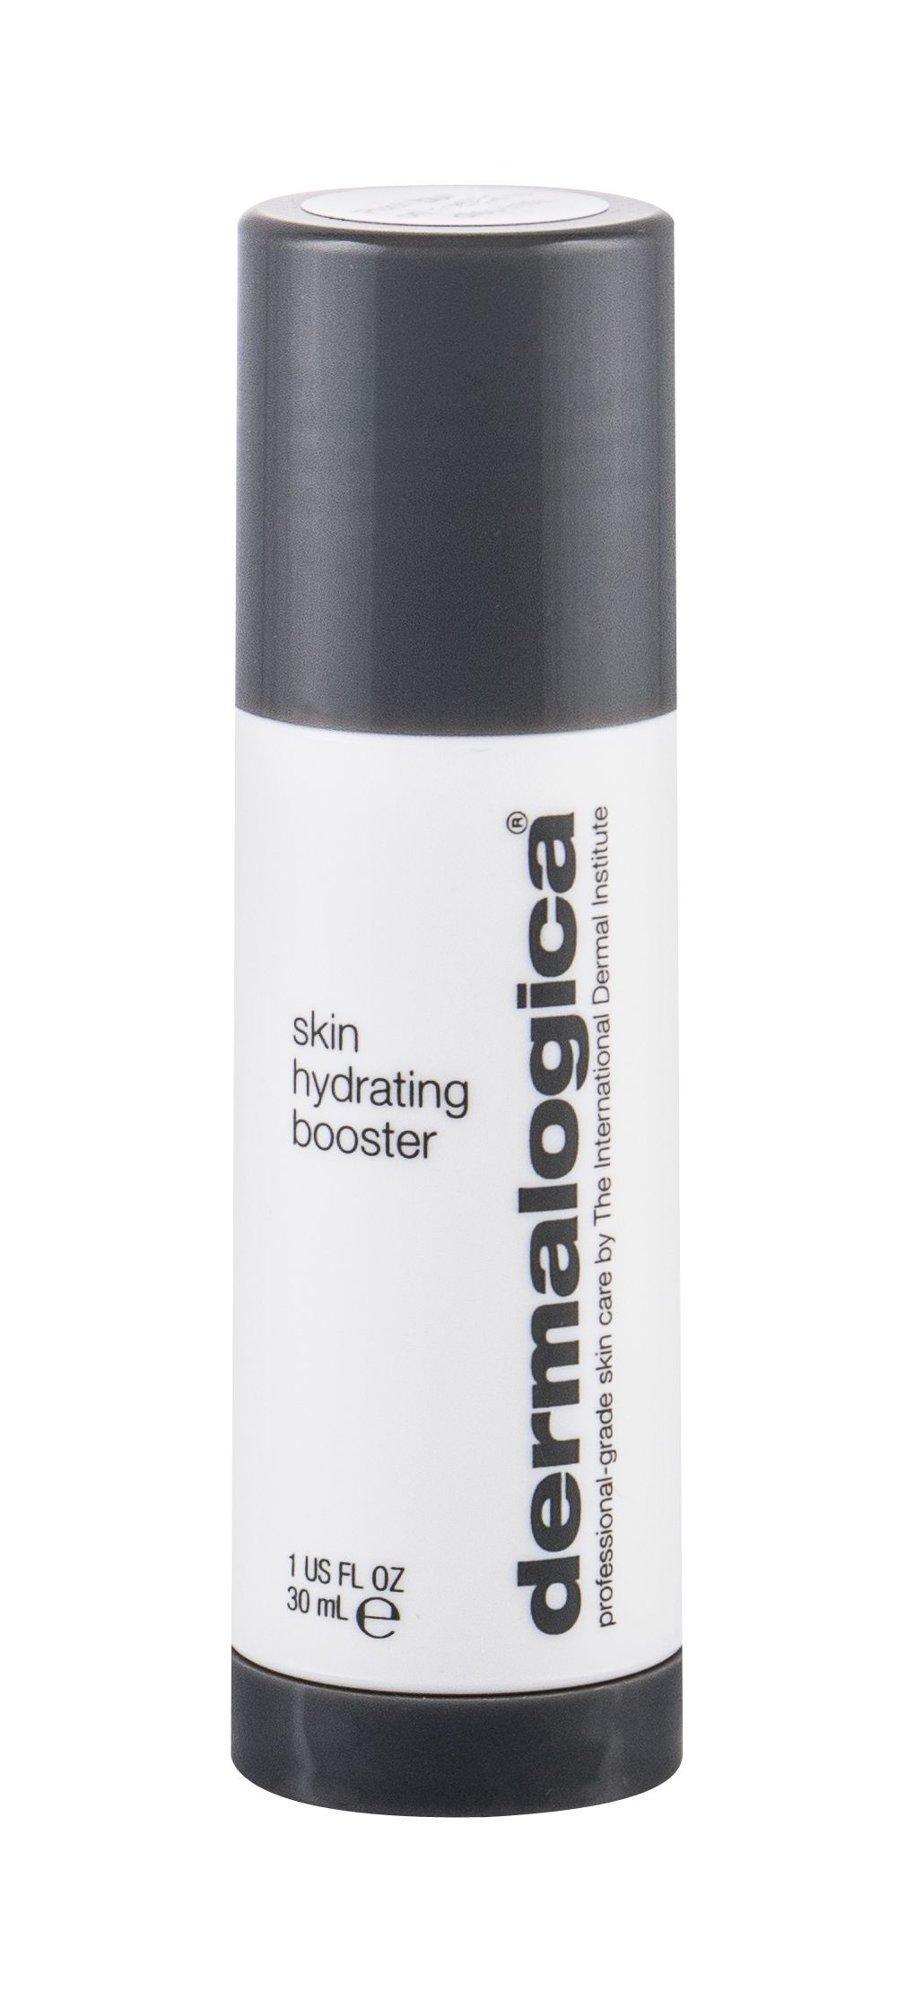 Dermalogica Daily Skin Health Skin Serum 30ml